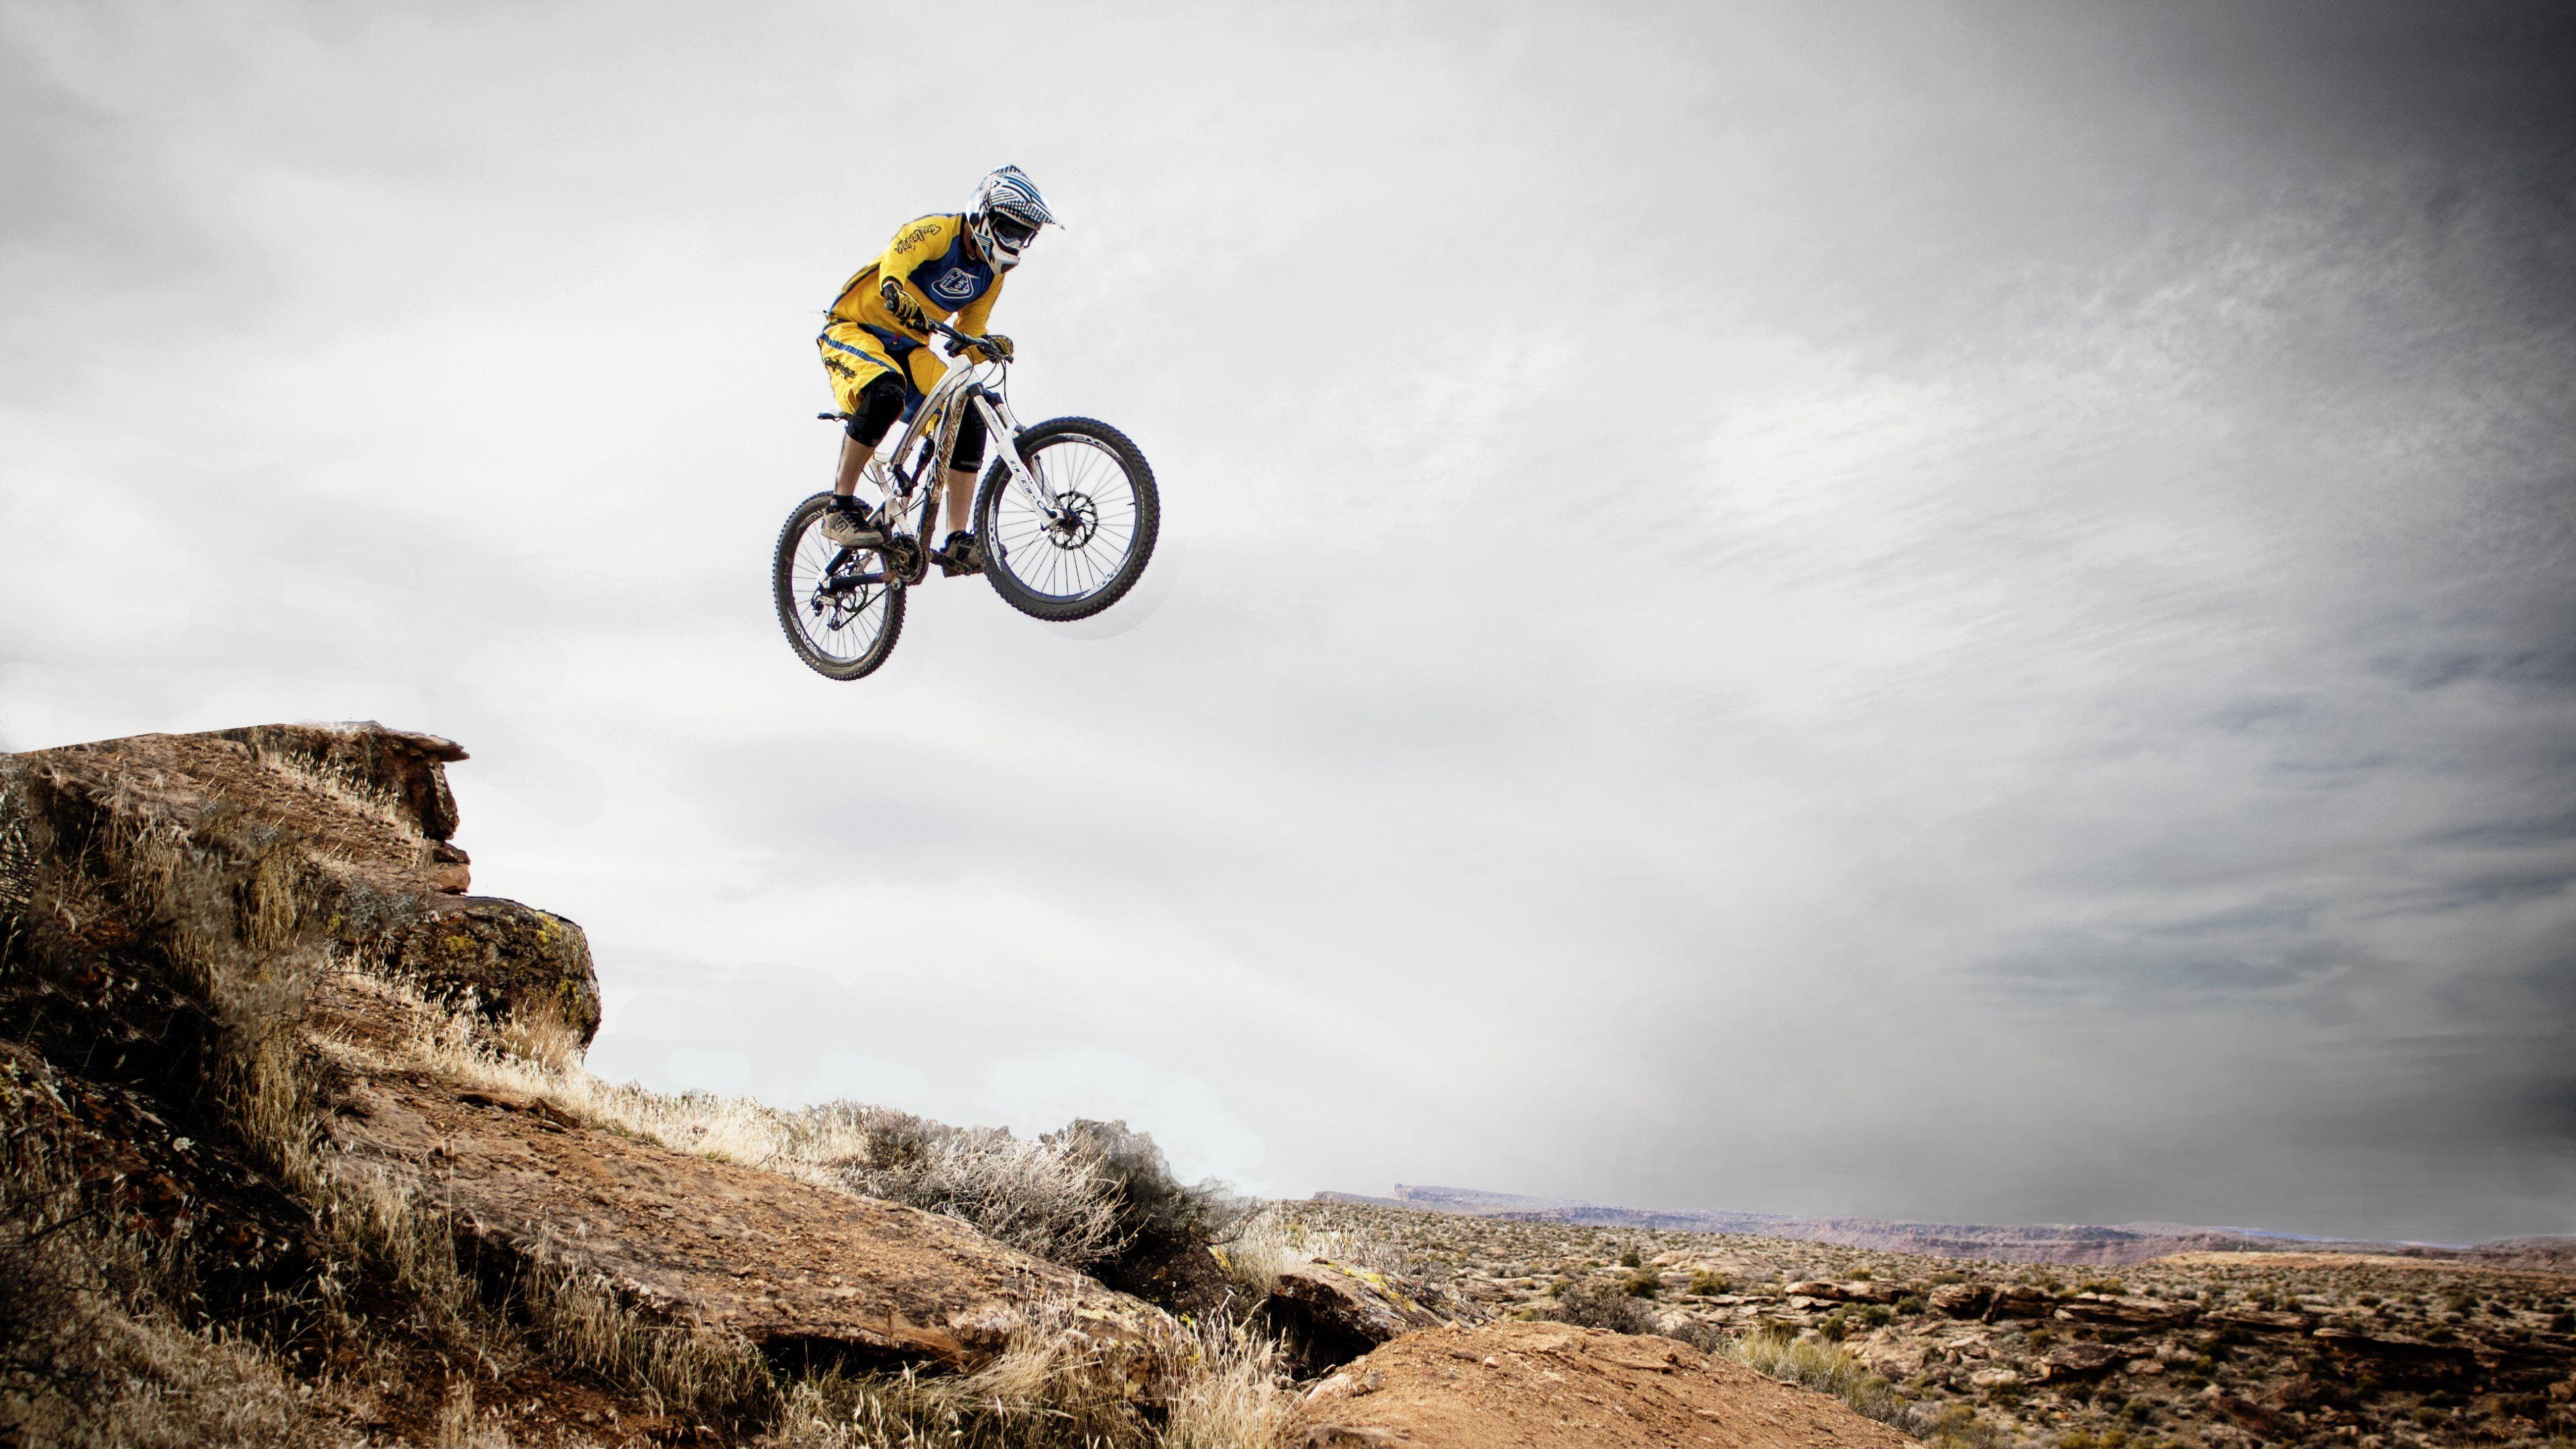 Pin By Austin Becker On Mtb Mountain Biking Best Mountain Bikes Adventure Sports